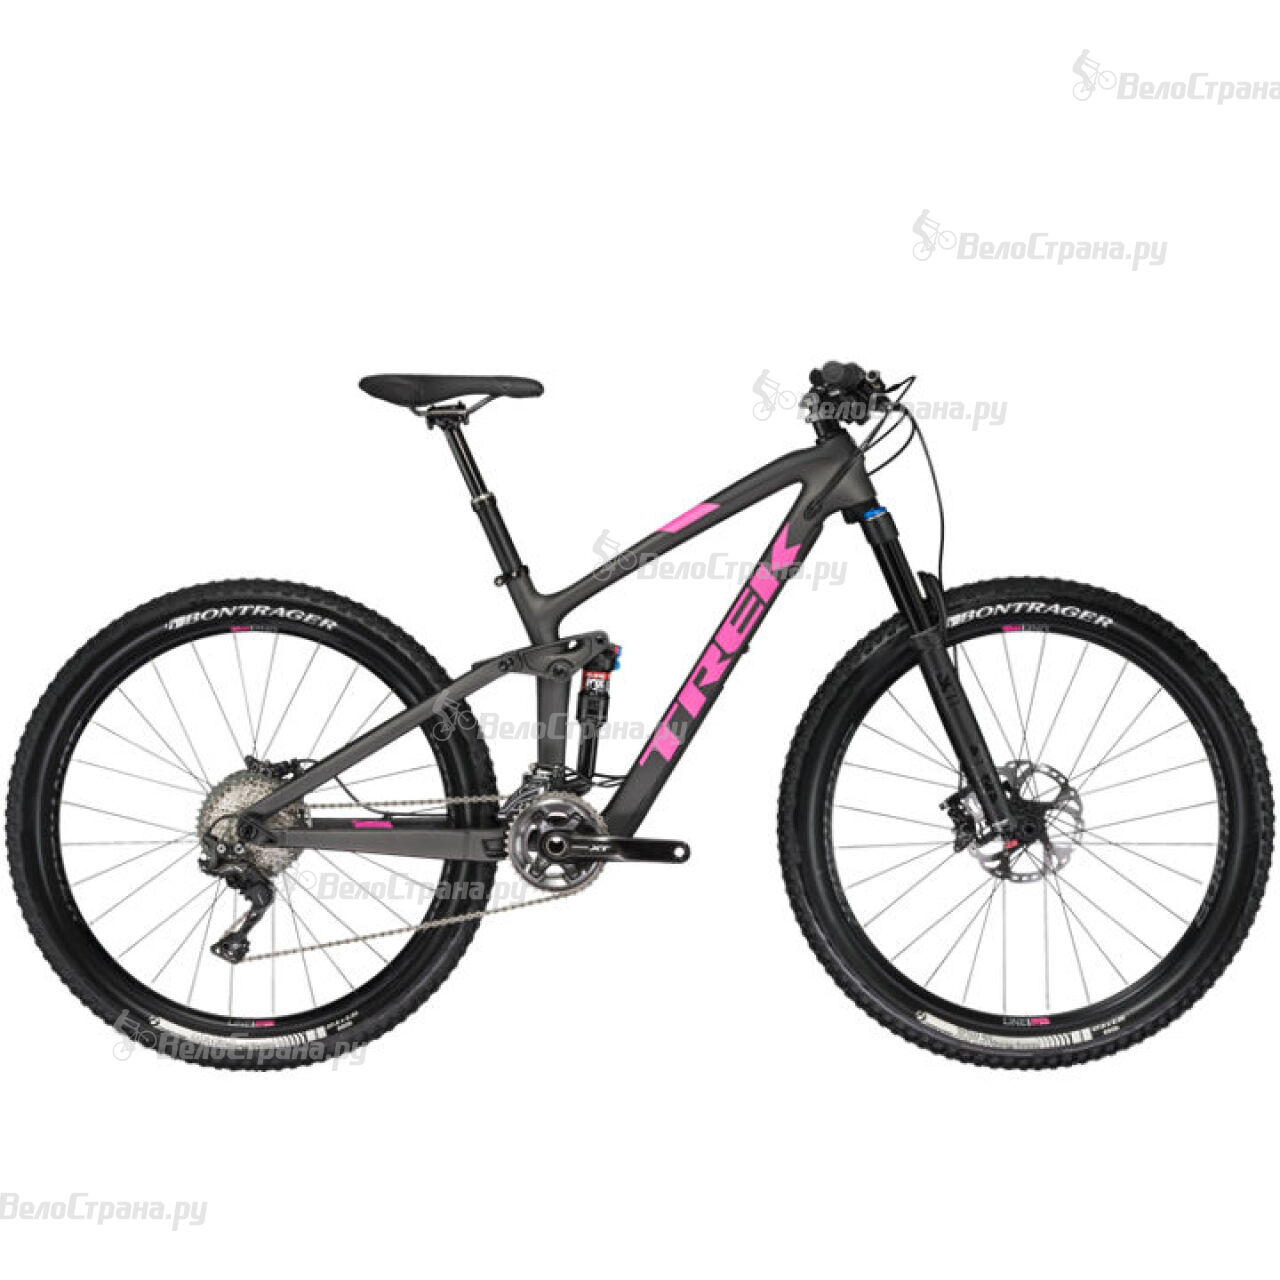 Велосипед Trek Fuel EX 9.8 WSD (2017) велосипед trek fuel ex 9 29 2017